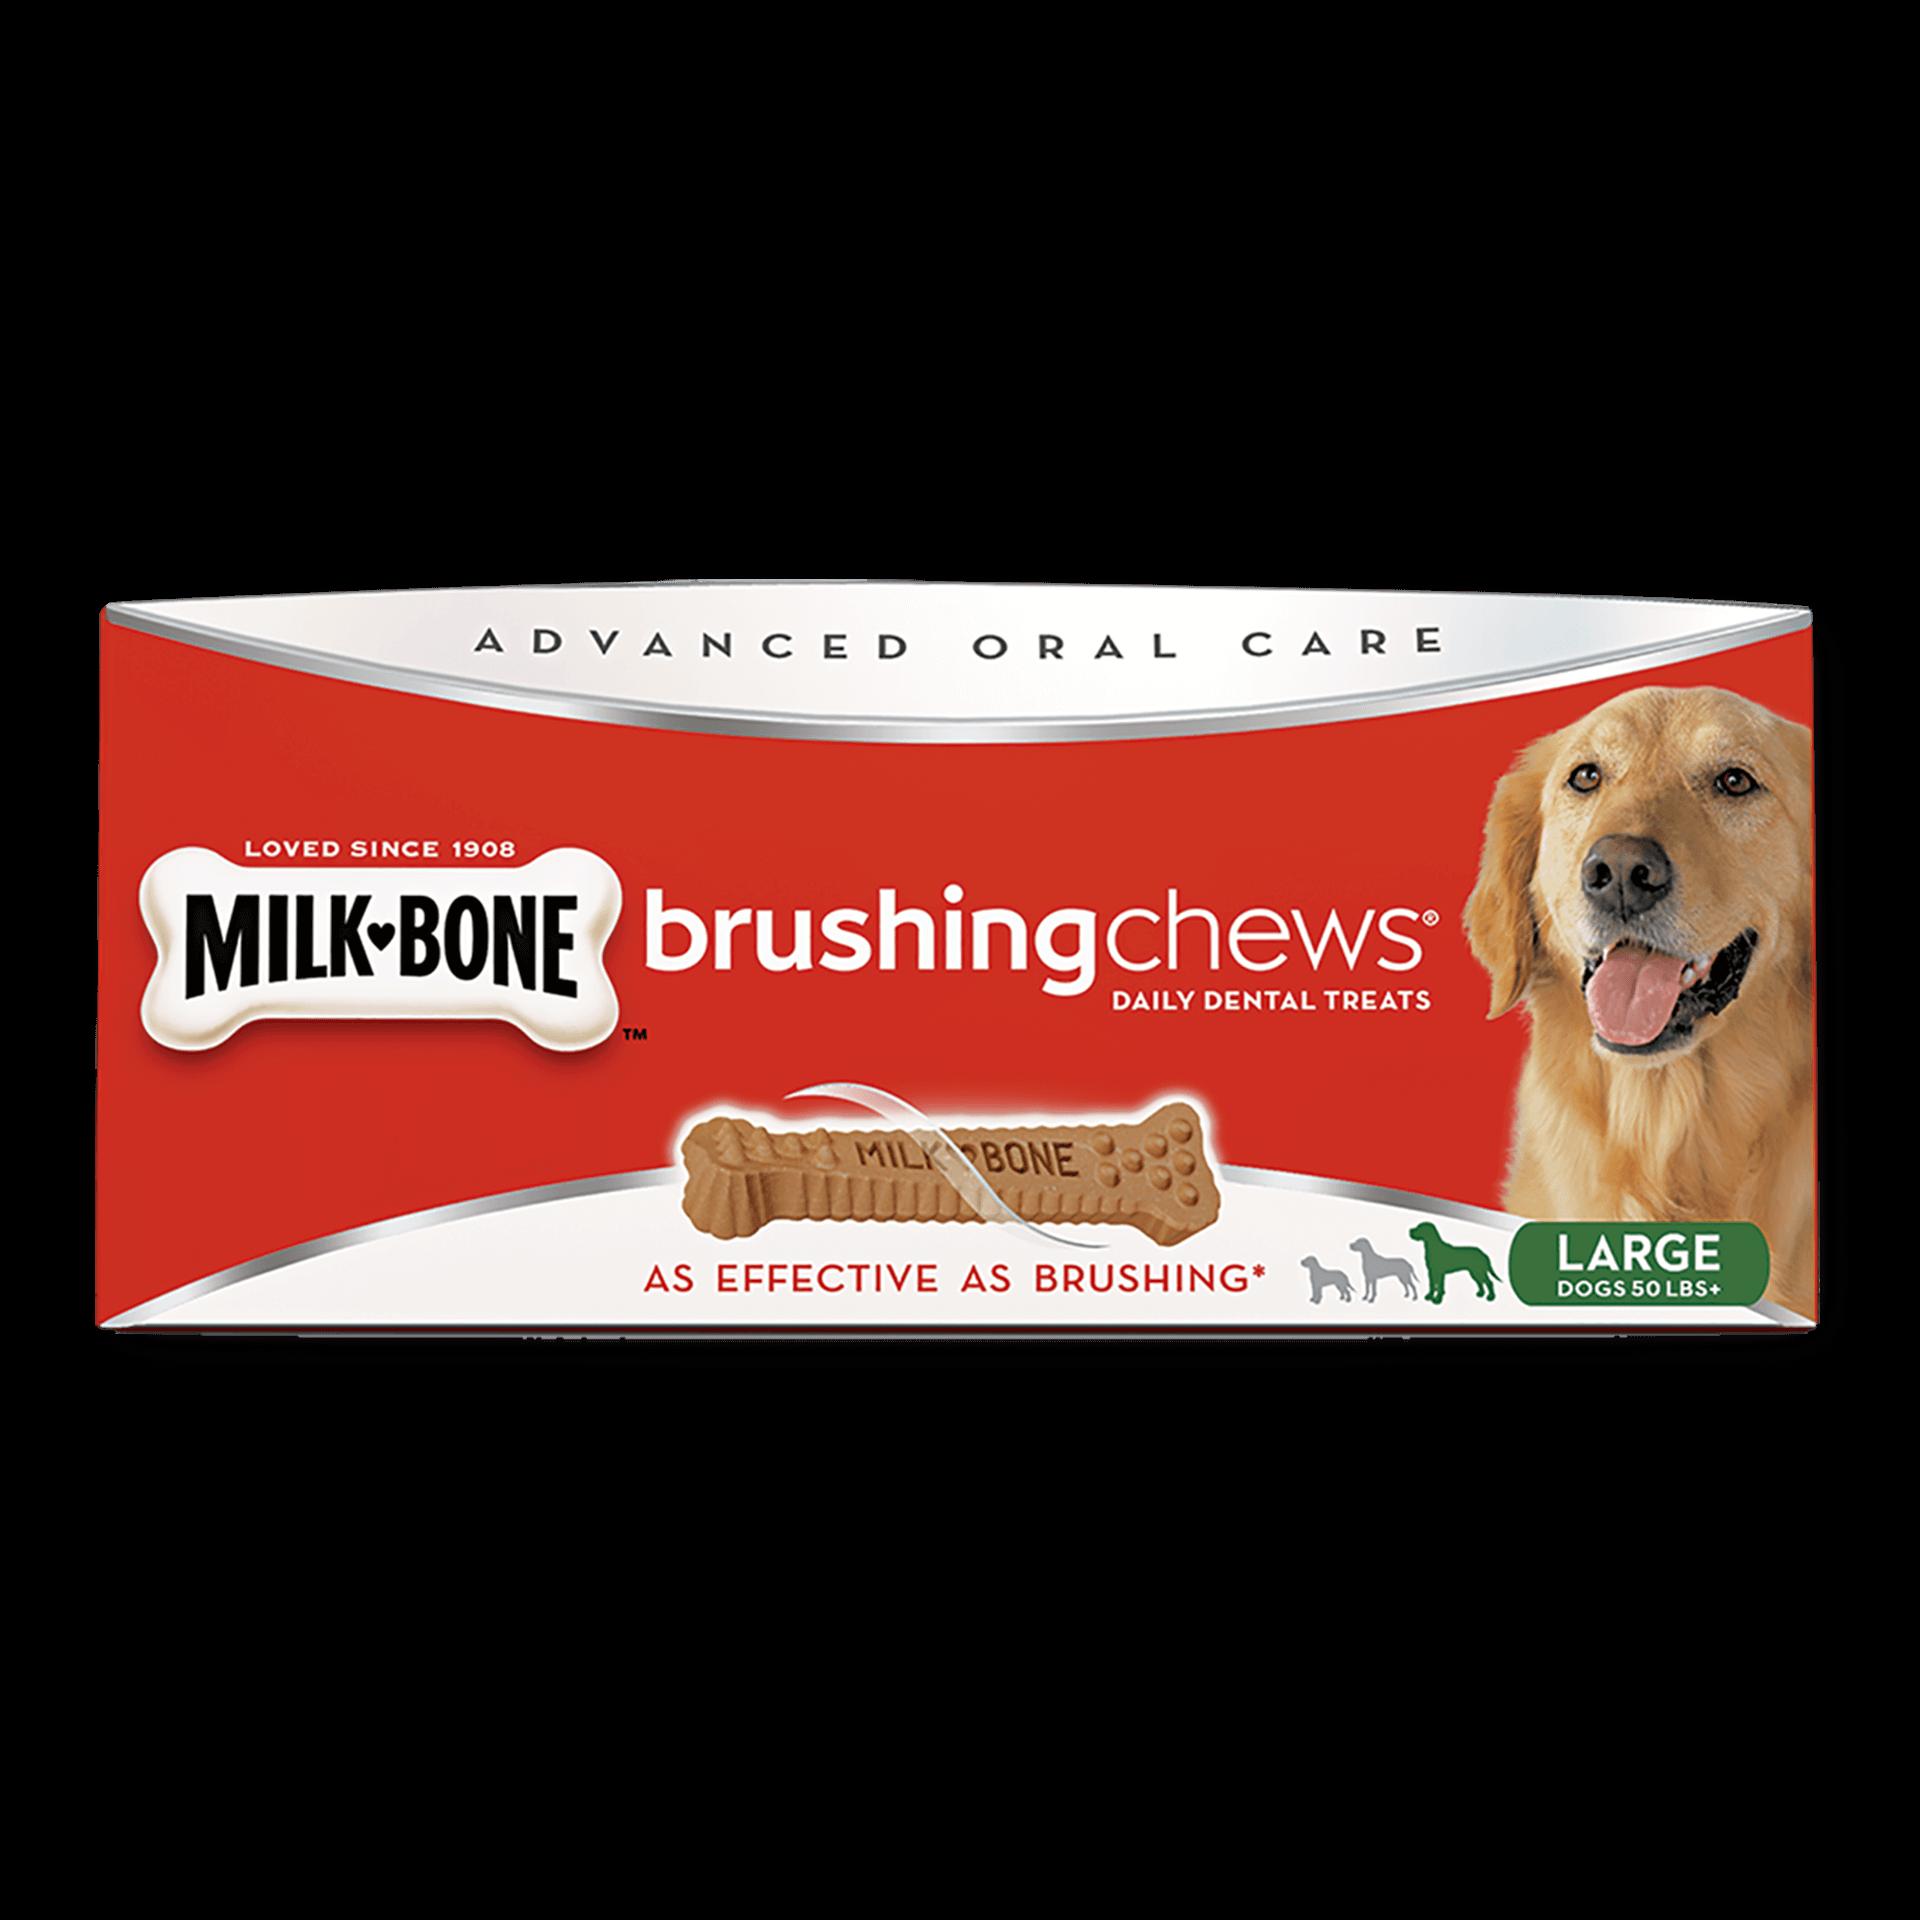 graphic transparent stock Milk brushing chews daily. Bone transparent dog treat